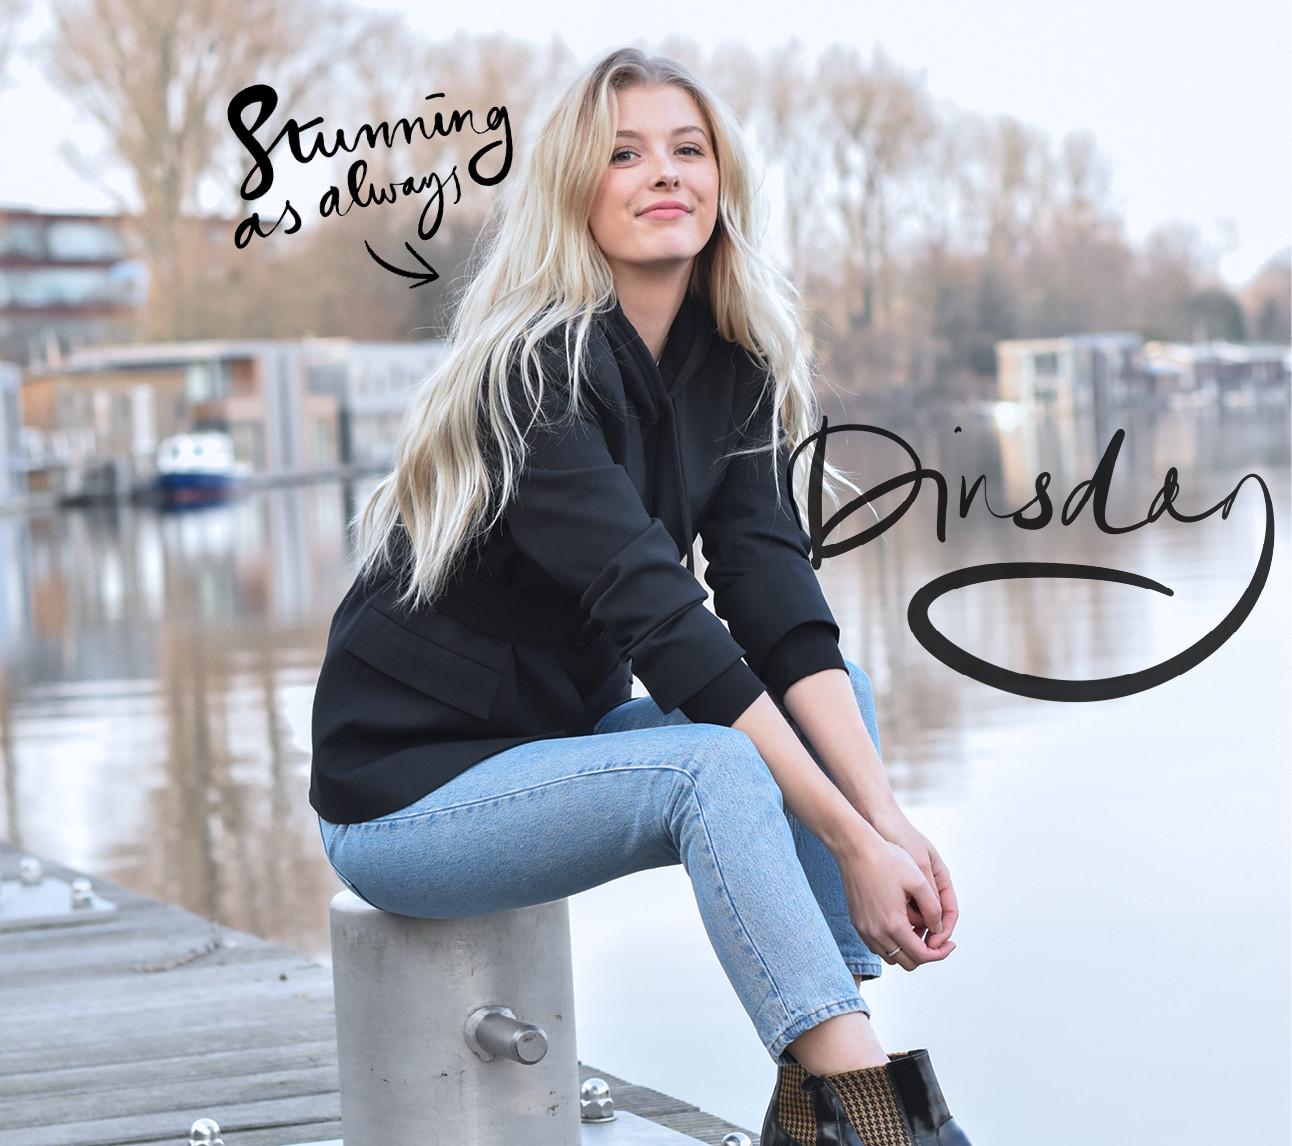 annabelle lachend bij het water in Amsterdam